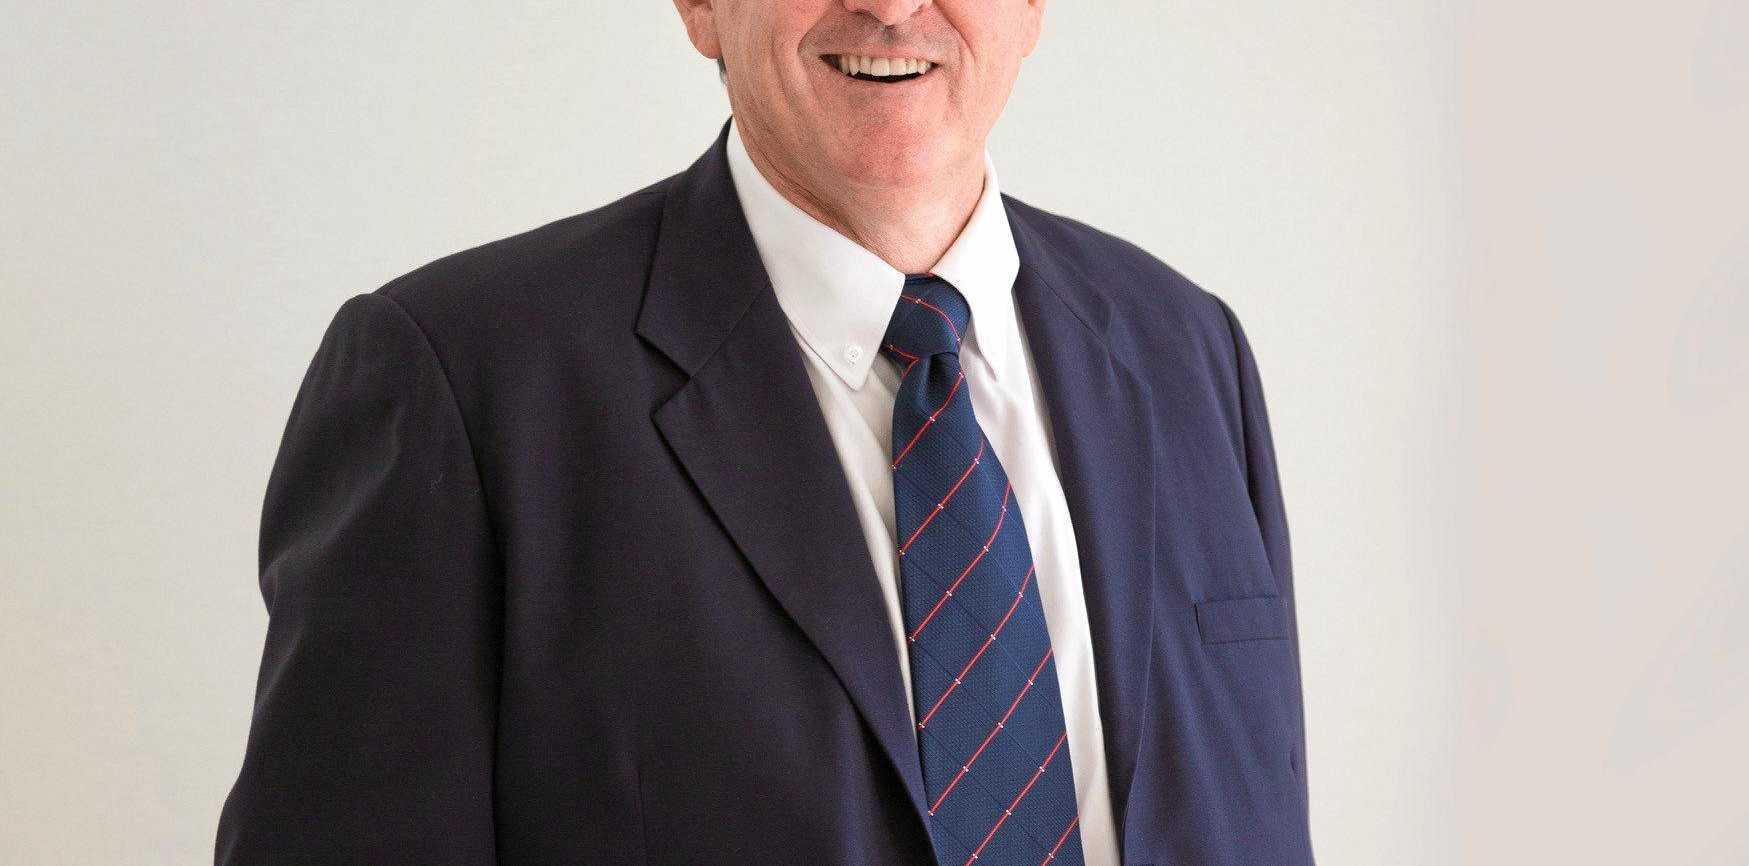 BIG PLANS: Maryborough's Tony Nioa is the new deputy chairman of Regional Development Australia Wide Bay Burnett.